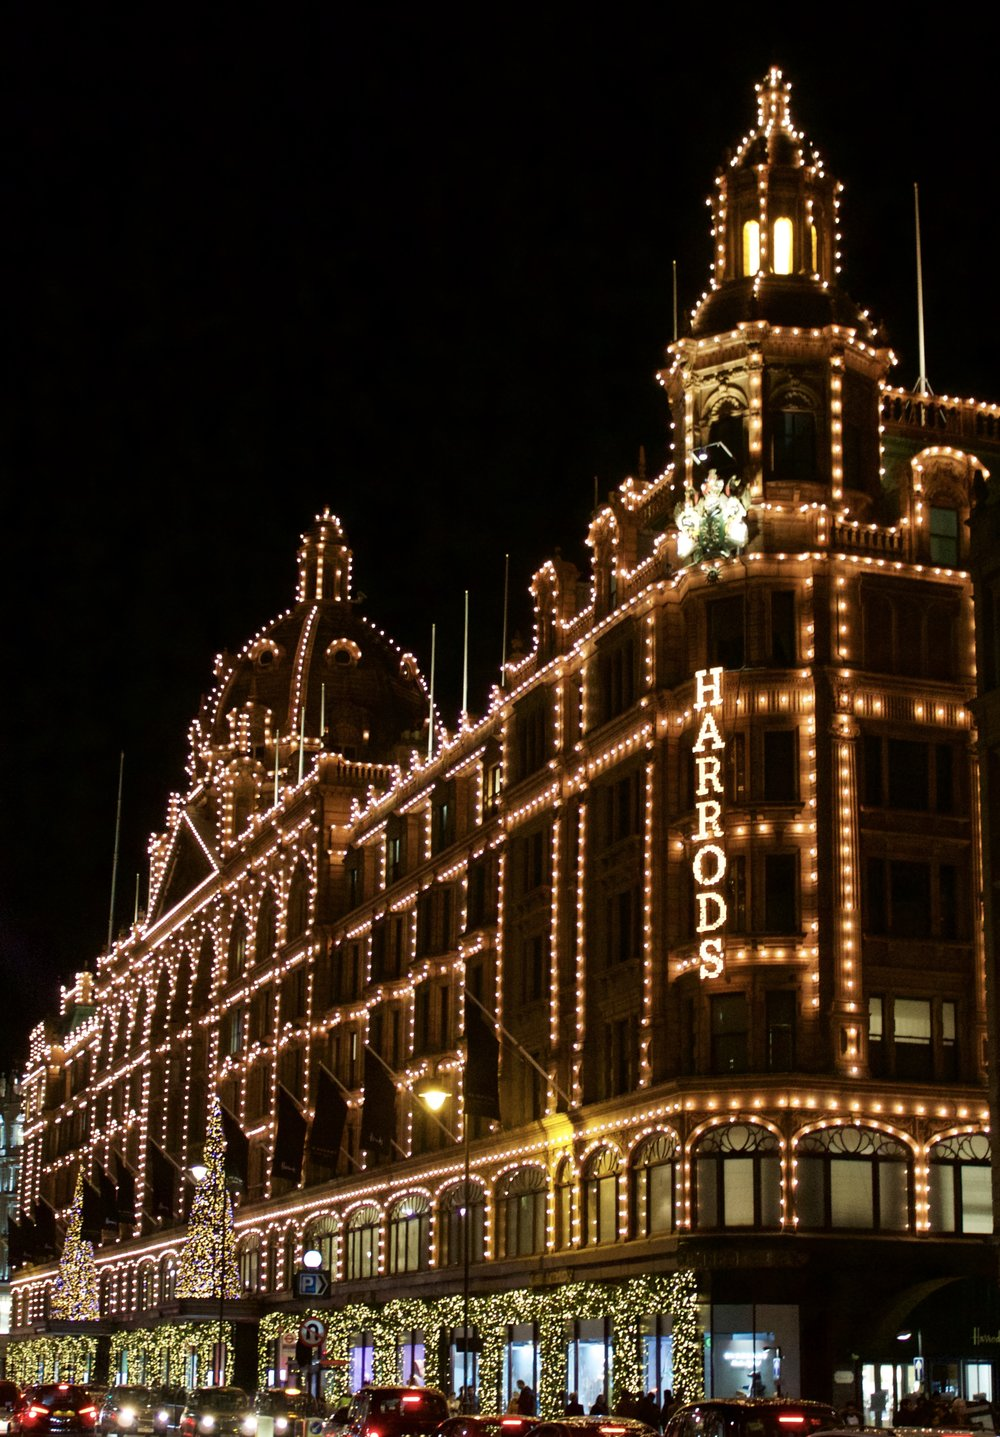 Harrods // London England // Samantha McNeil Blog